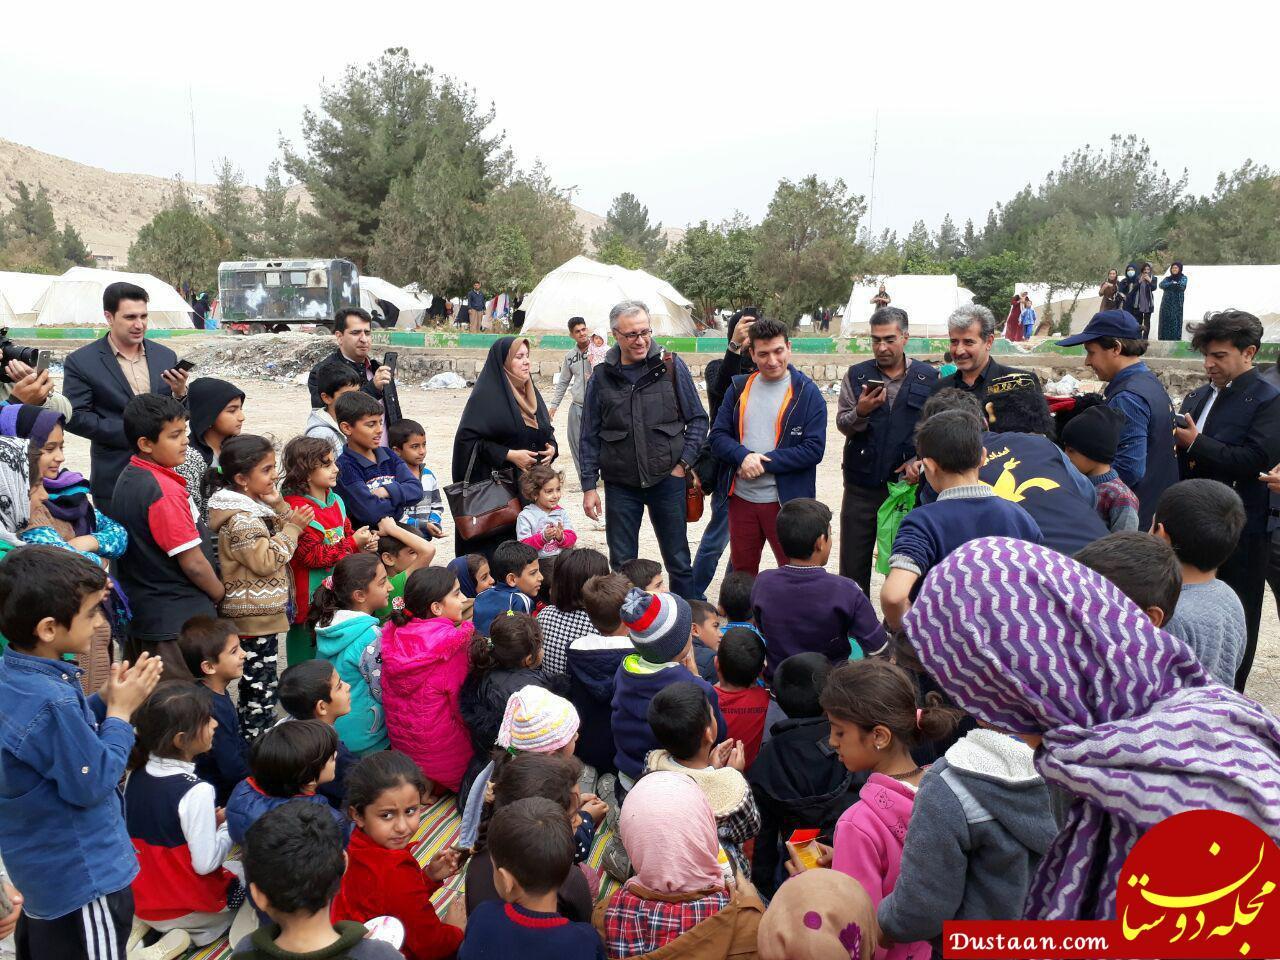 www.dustaan.com عمو های فتیله ای جمع کودکان زلزله زده +عکس